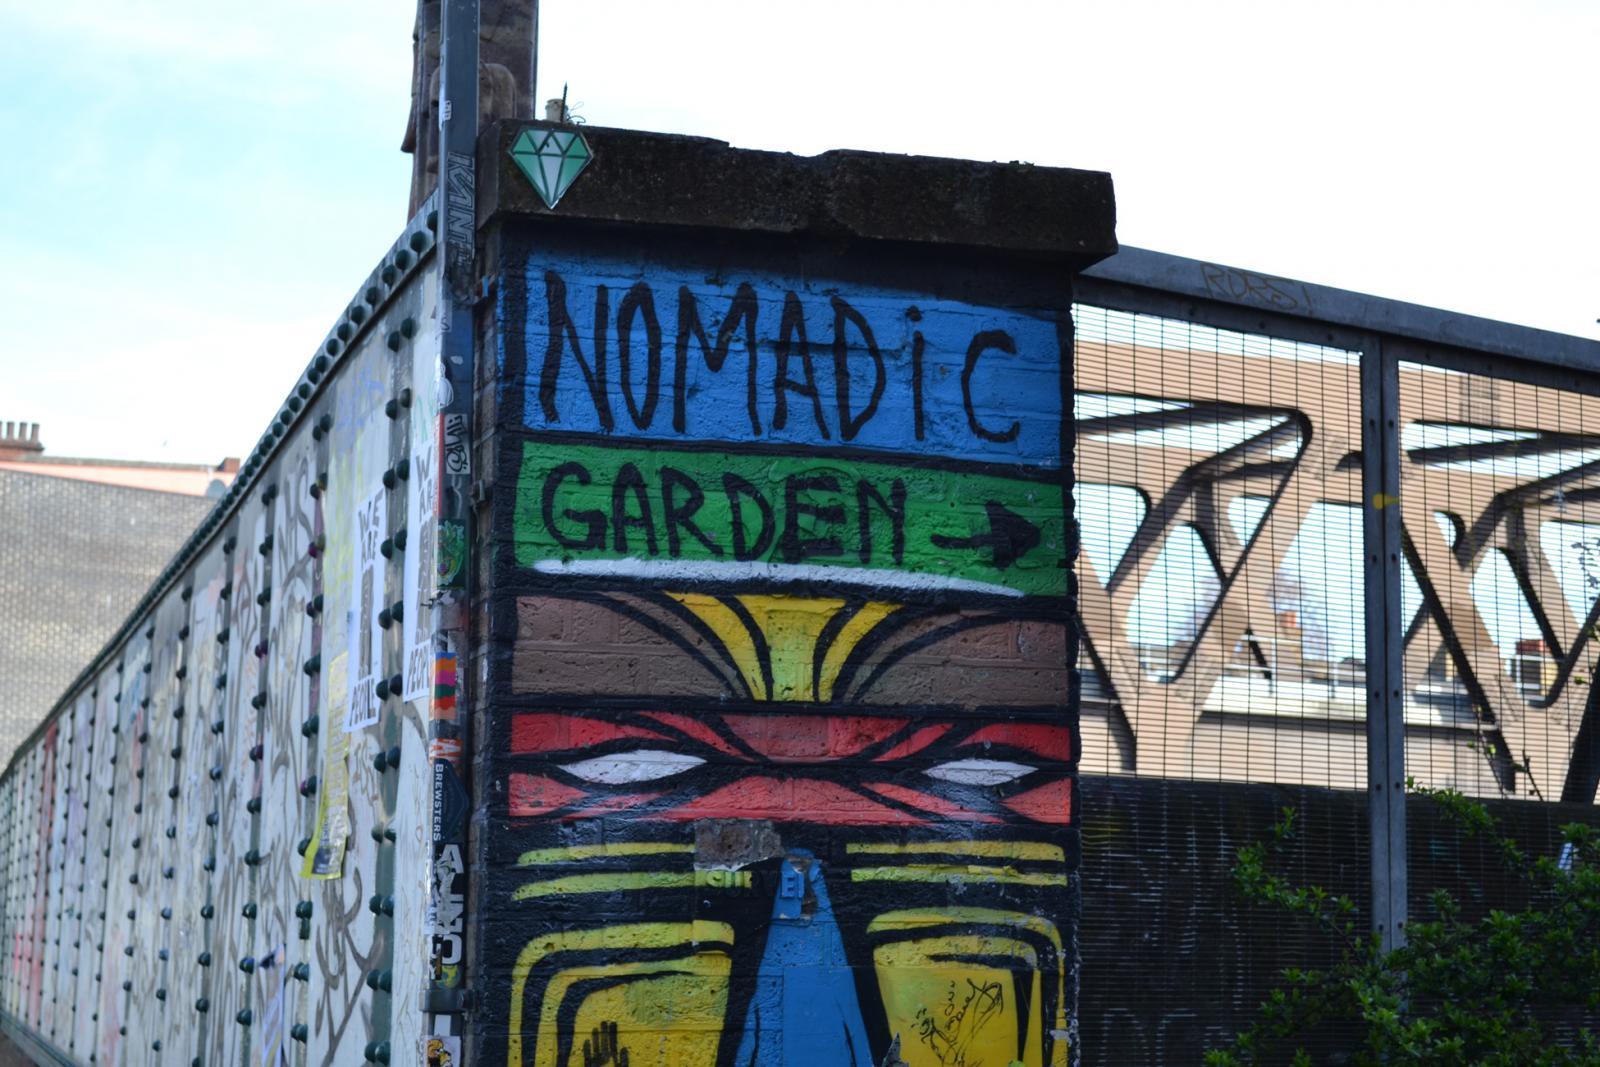 Nomadic Garden in der Brick Lane